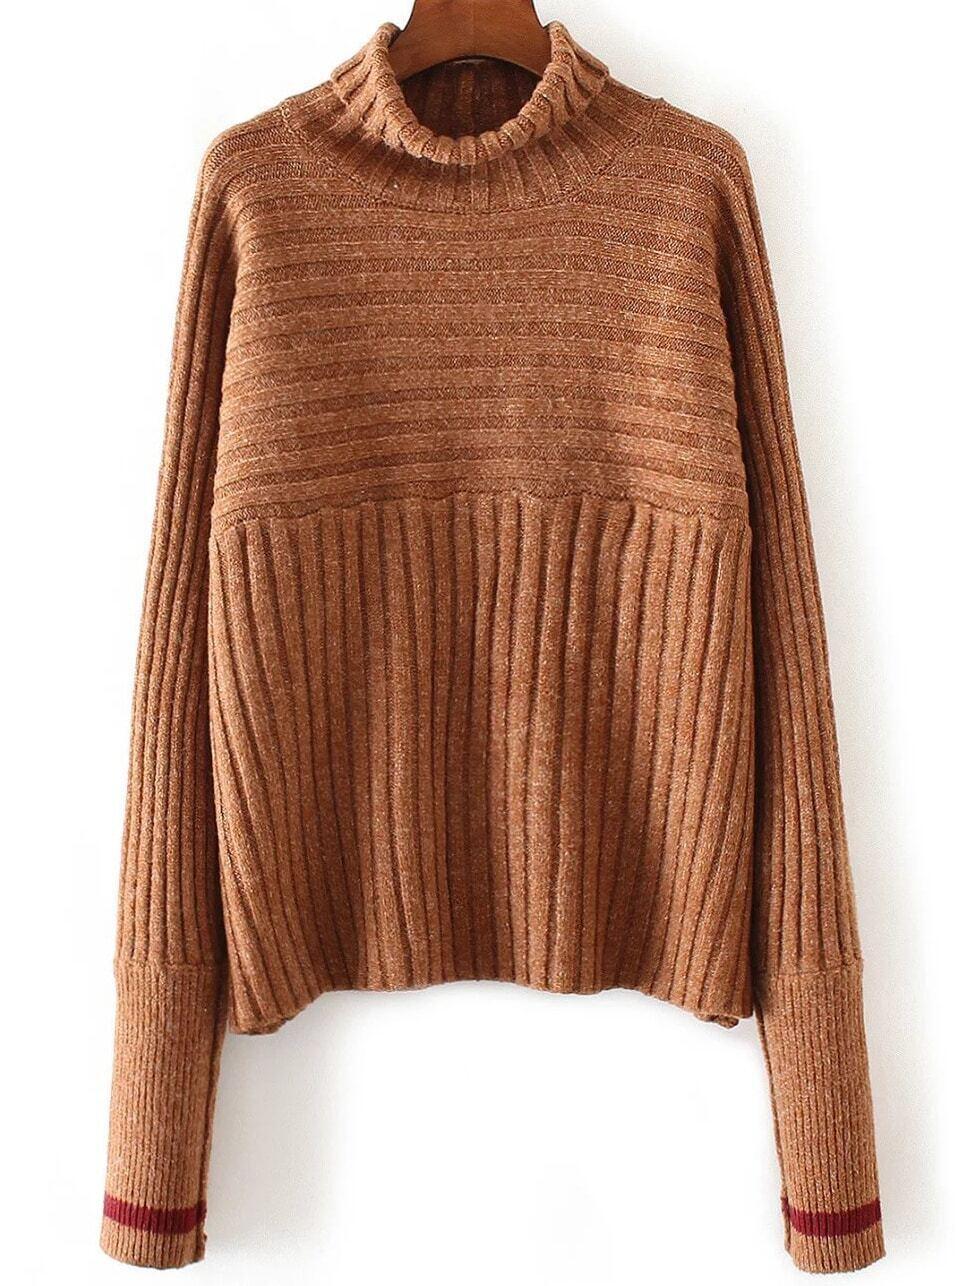 Khaki Turtleneck Contrast Cuff Ribbed Sweater sweater161014202